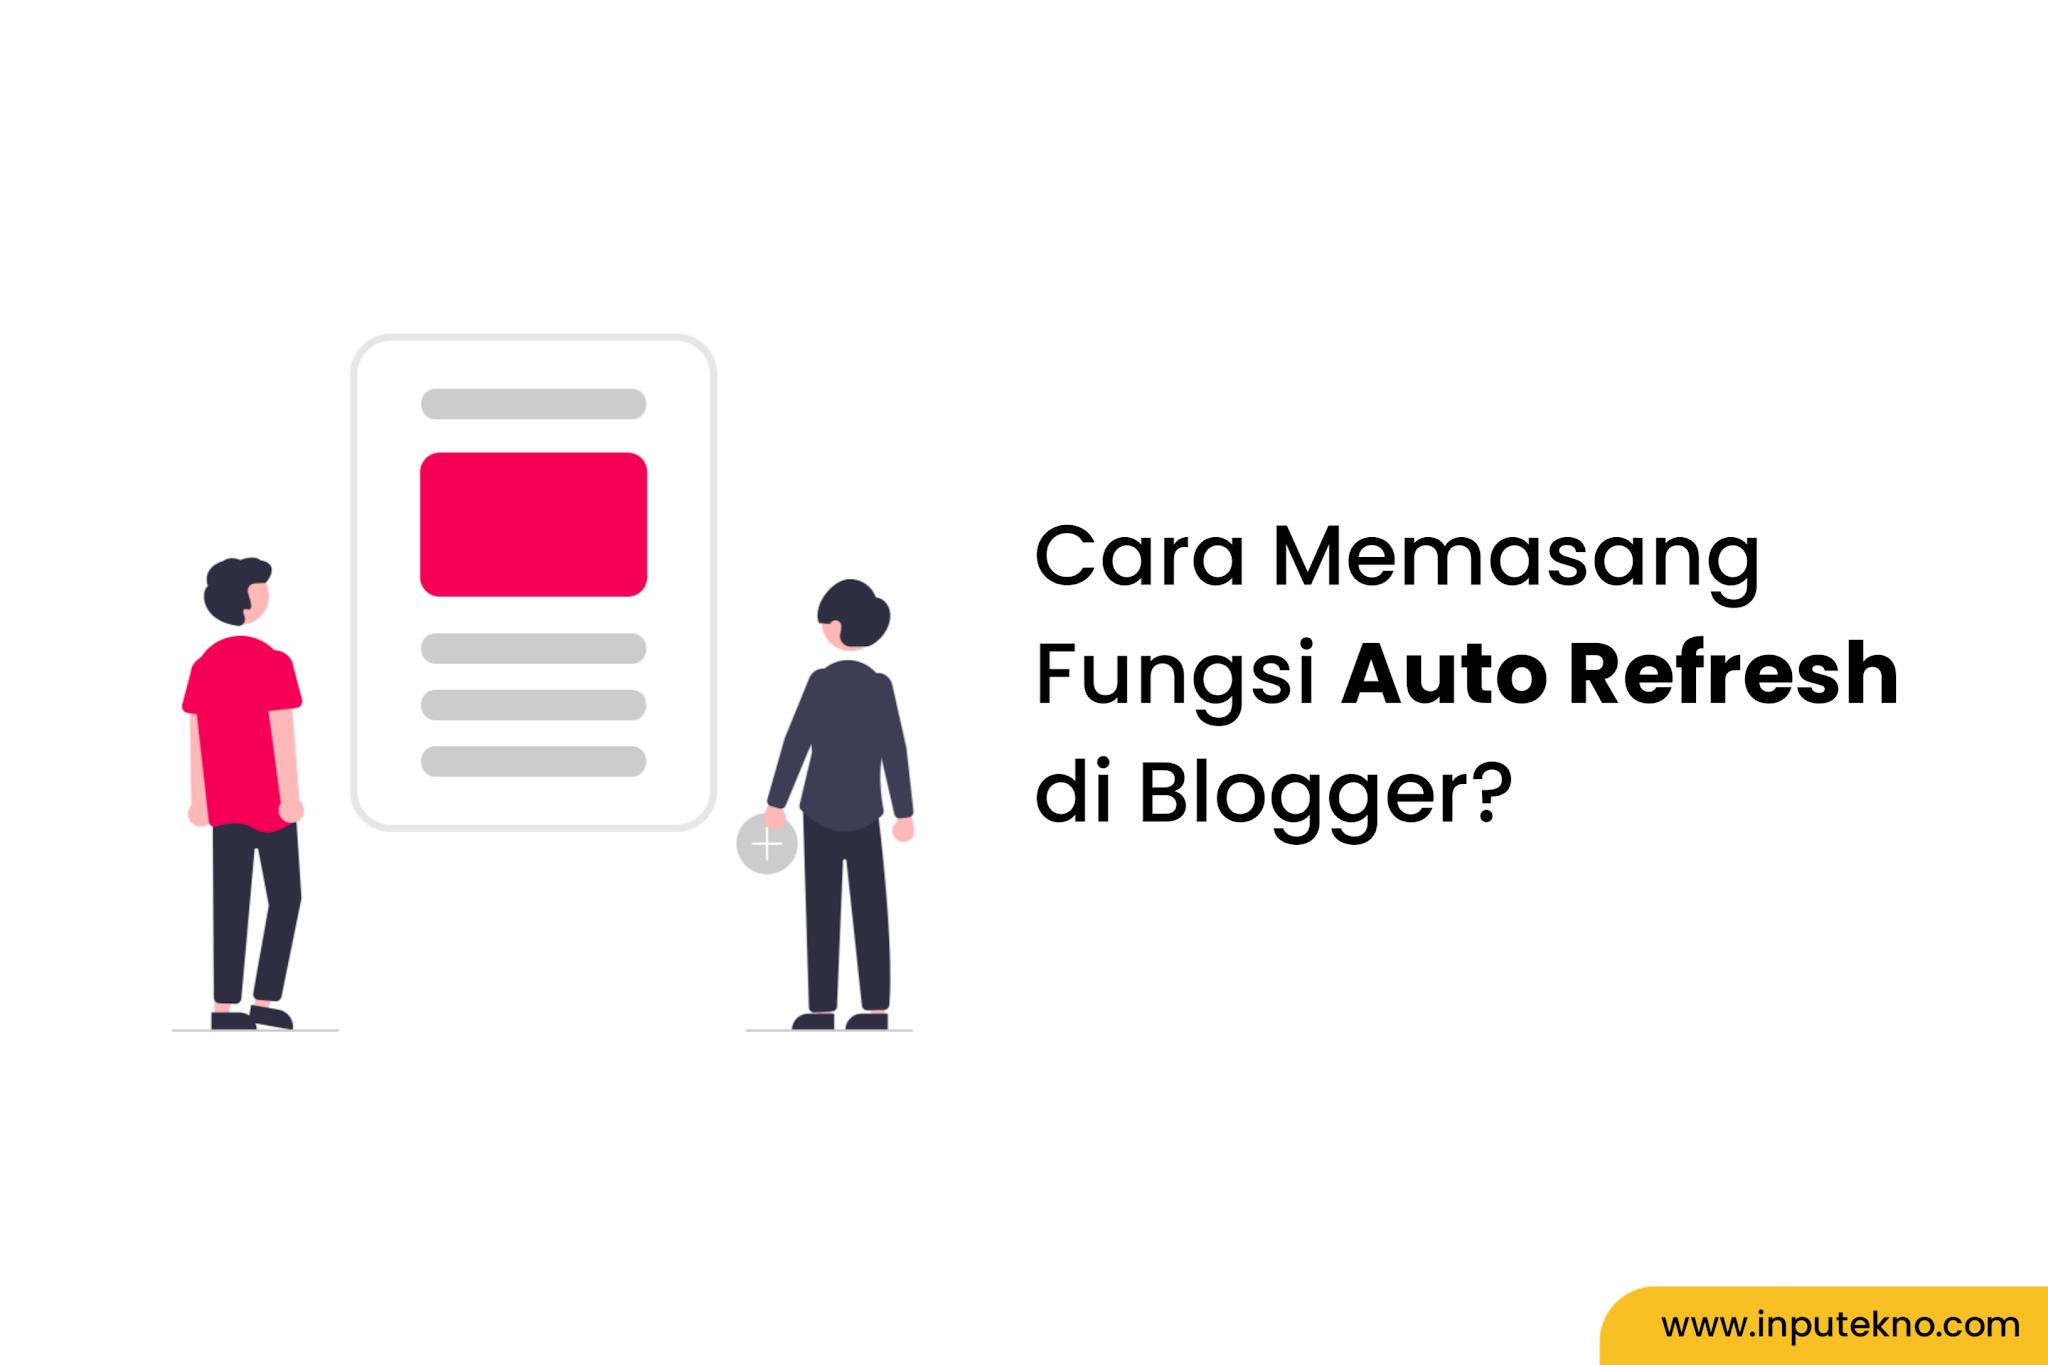 Cara Memasang Fungsi Auto Refresh di Blogger